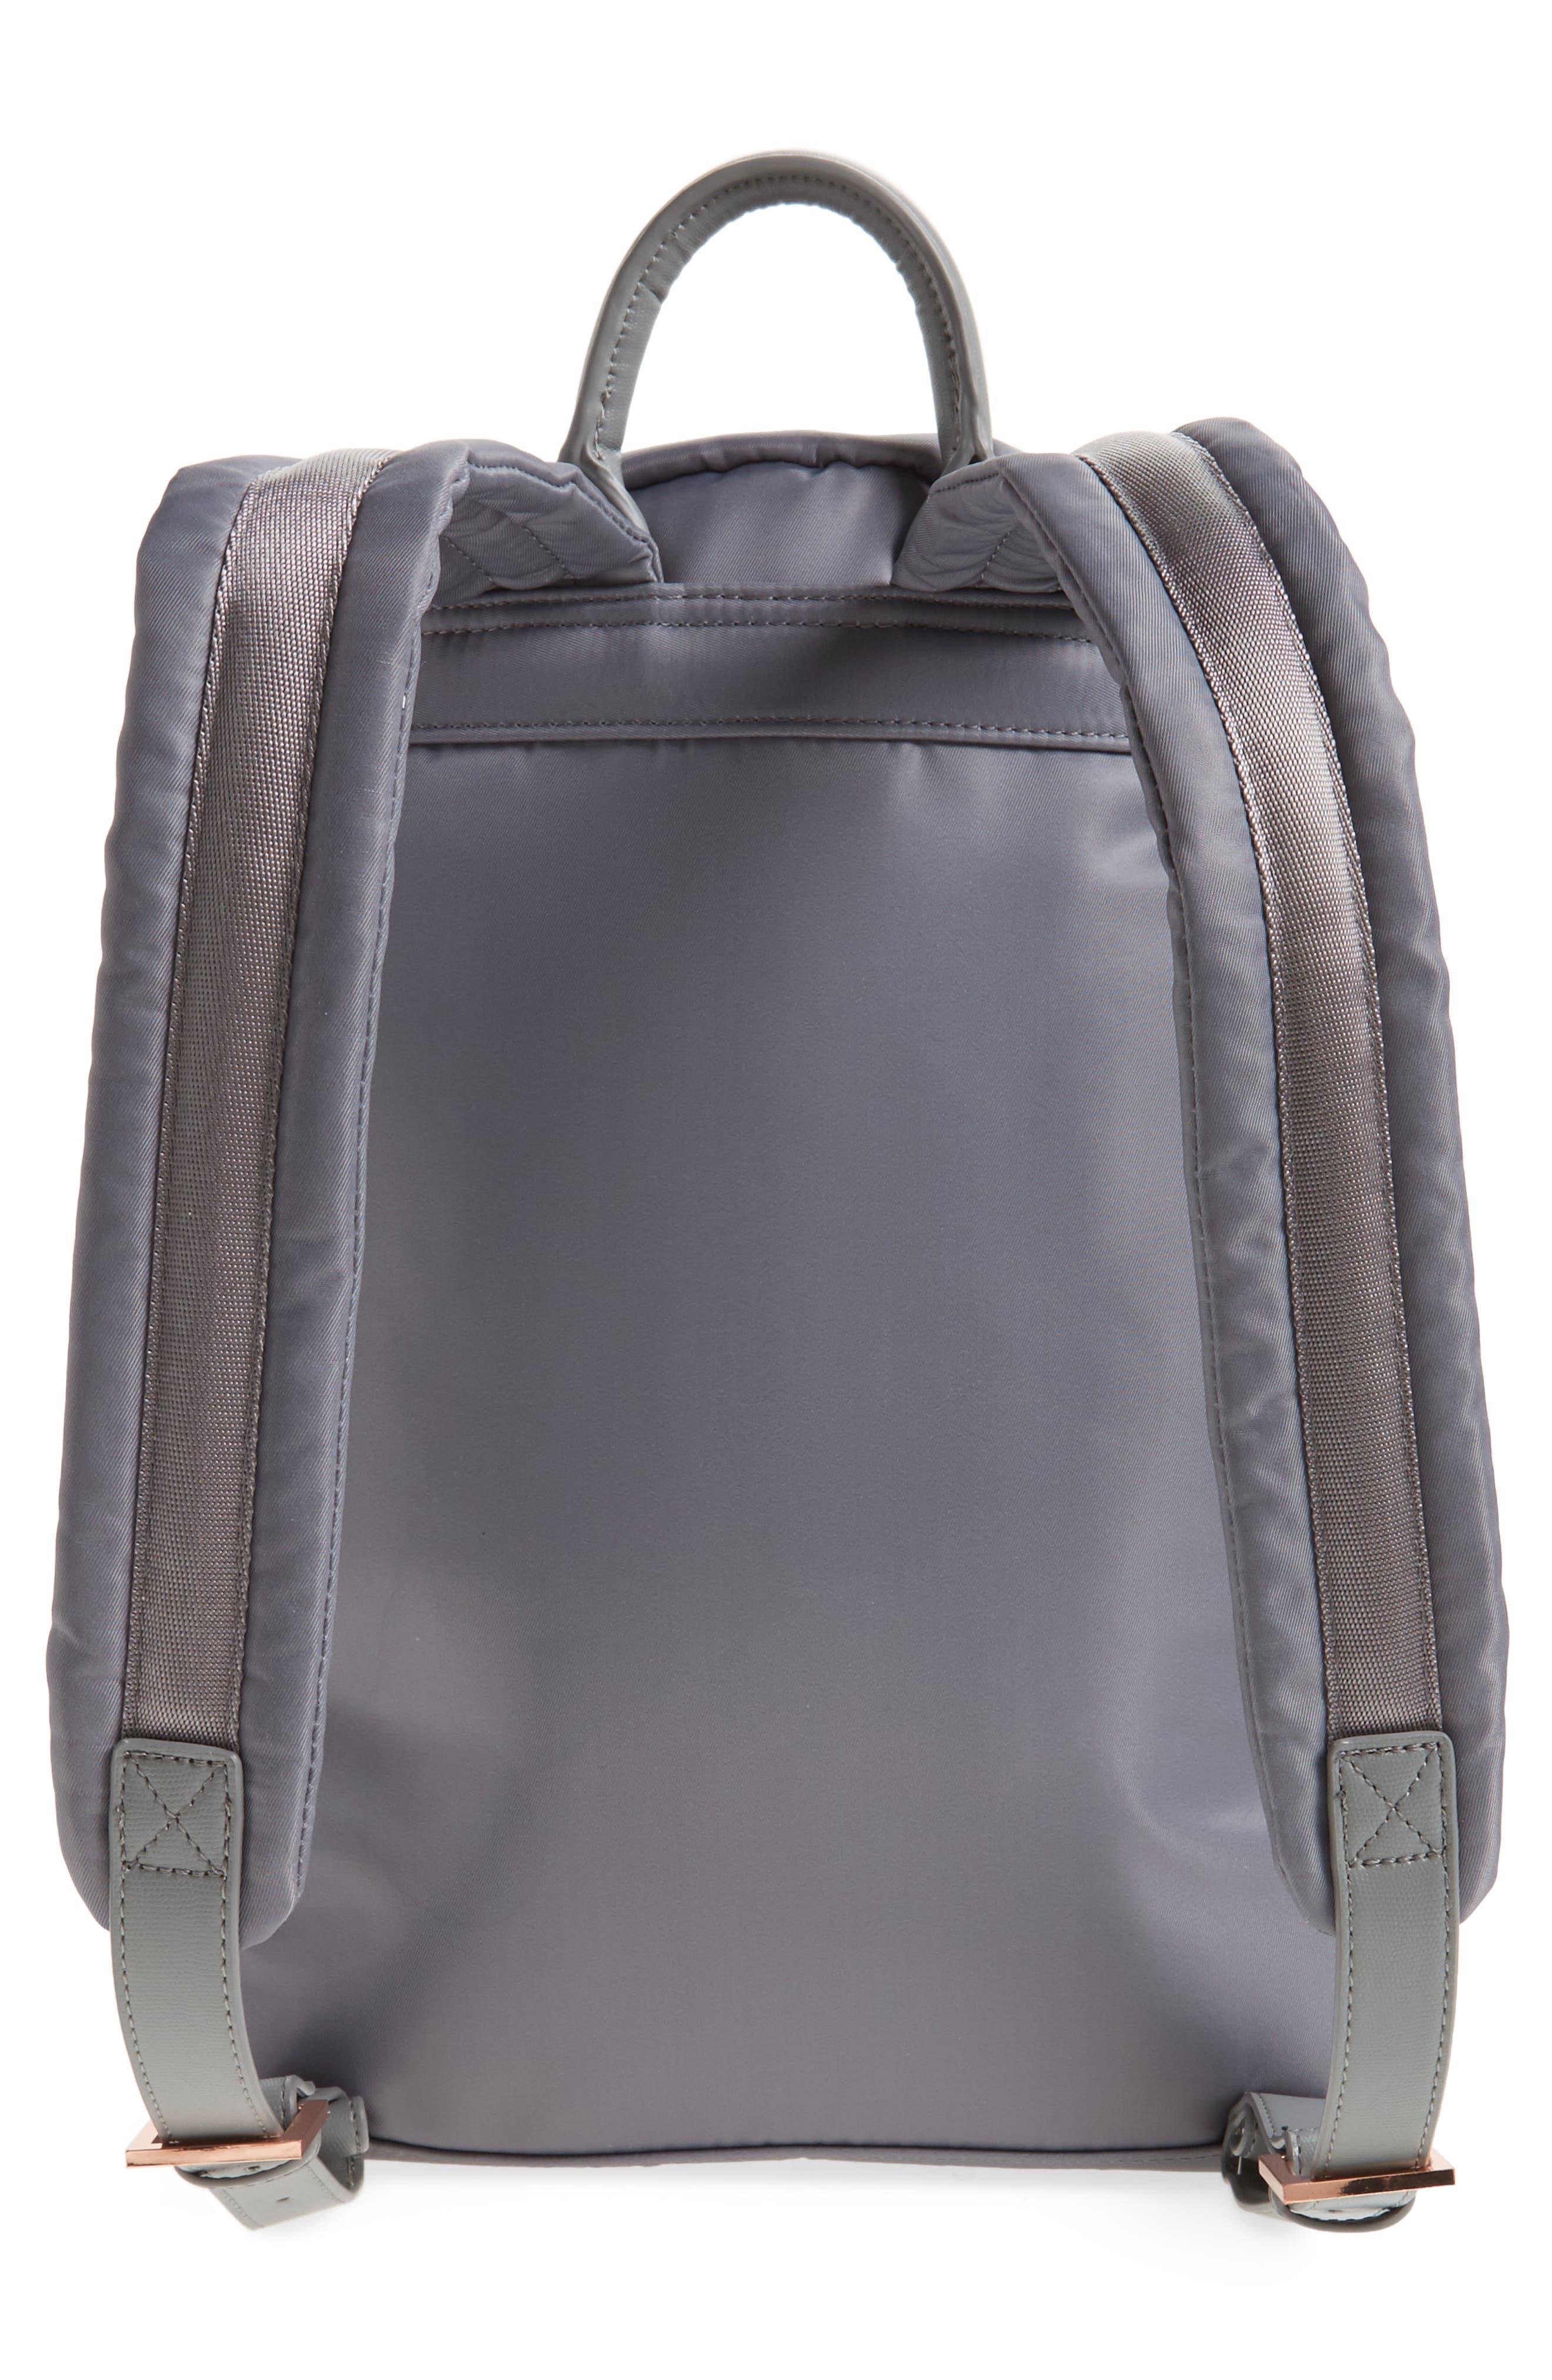 Olica Oriental Blossom Backpack,                             Alternate thumbnail 2, color,                             Light Grey